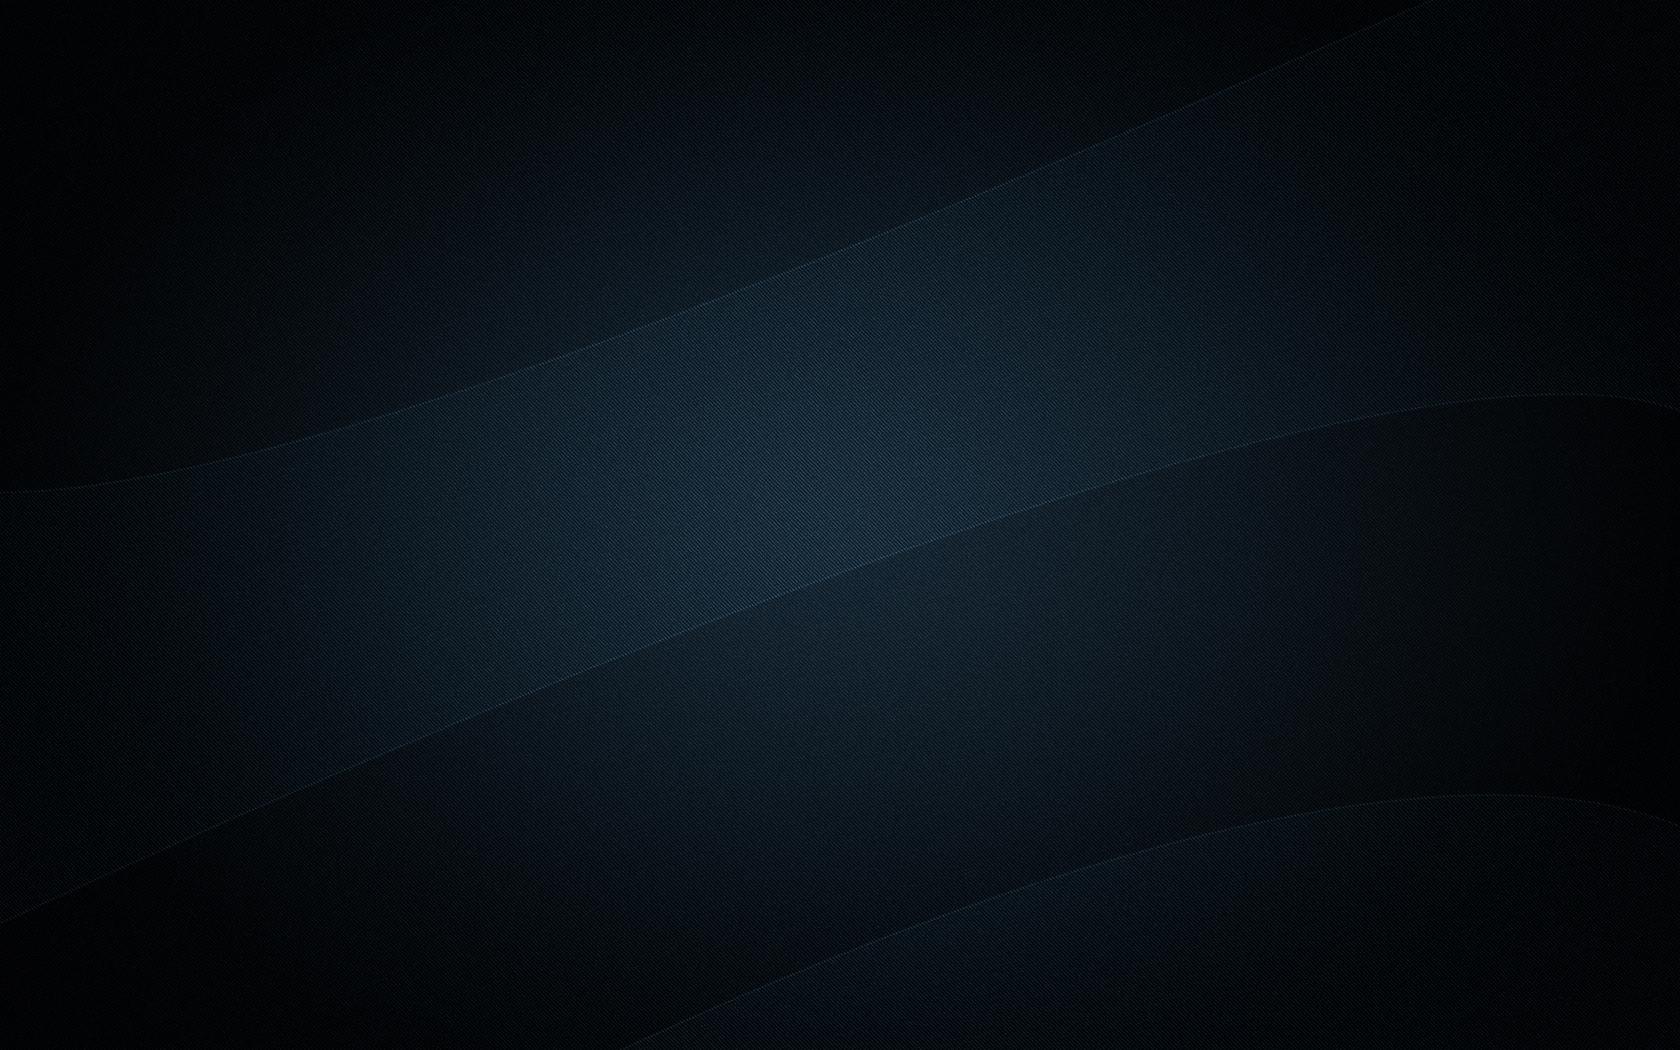 Navy Blue Background Wallpaper Navy swirlies 1680x1050